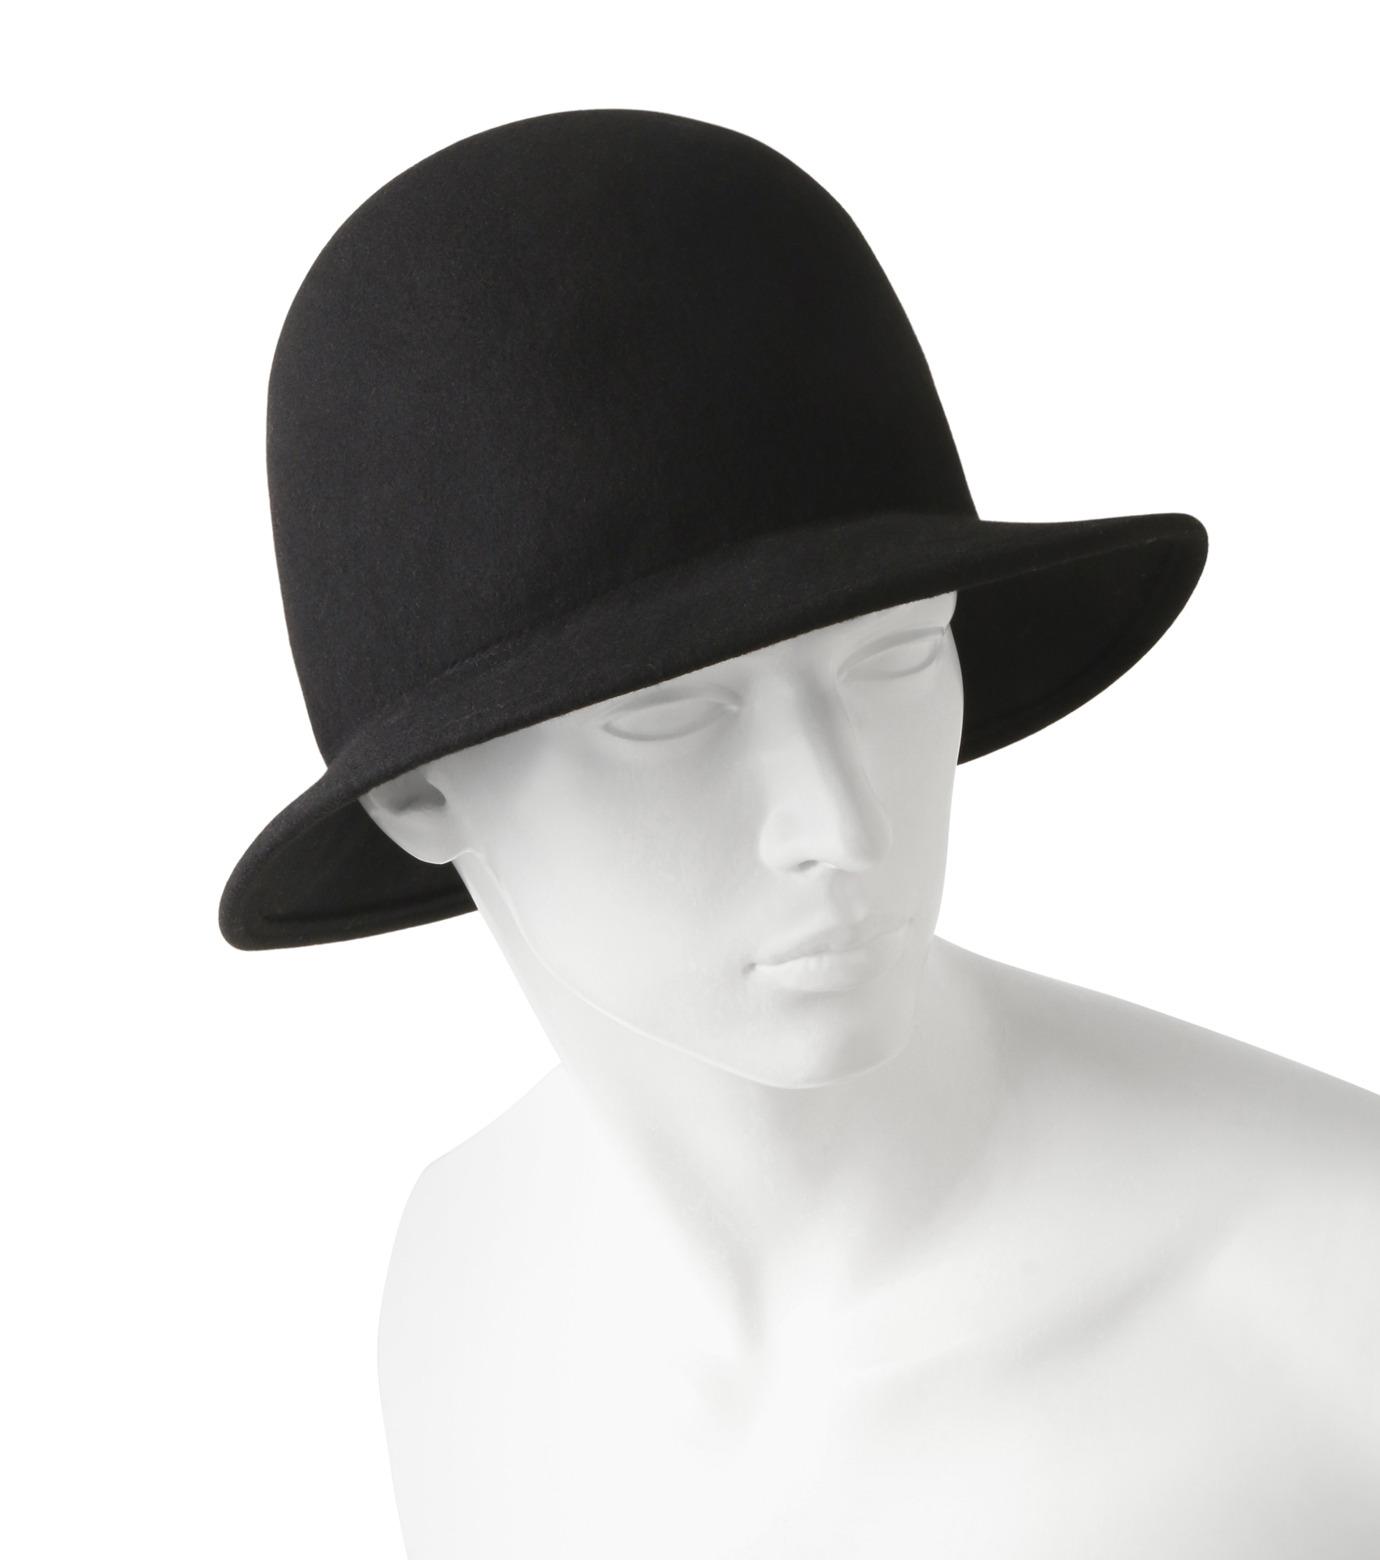 Sacai(サカイ)のHat-BLACK(キャップ/cap)-17-01274M-13 拡大詳細画像3